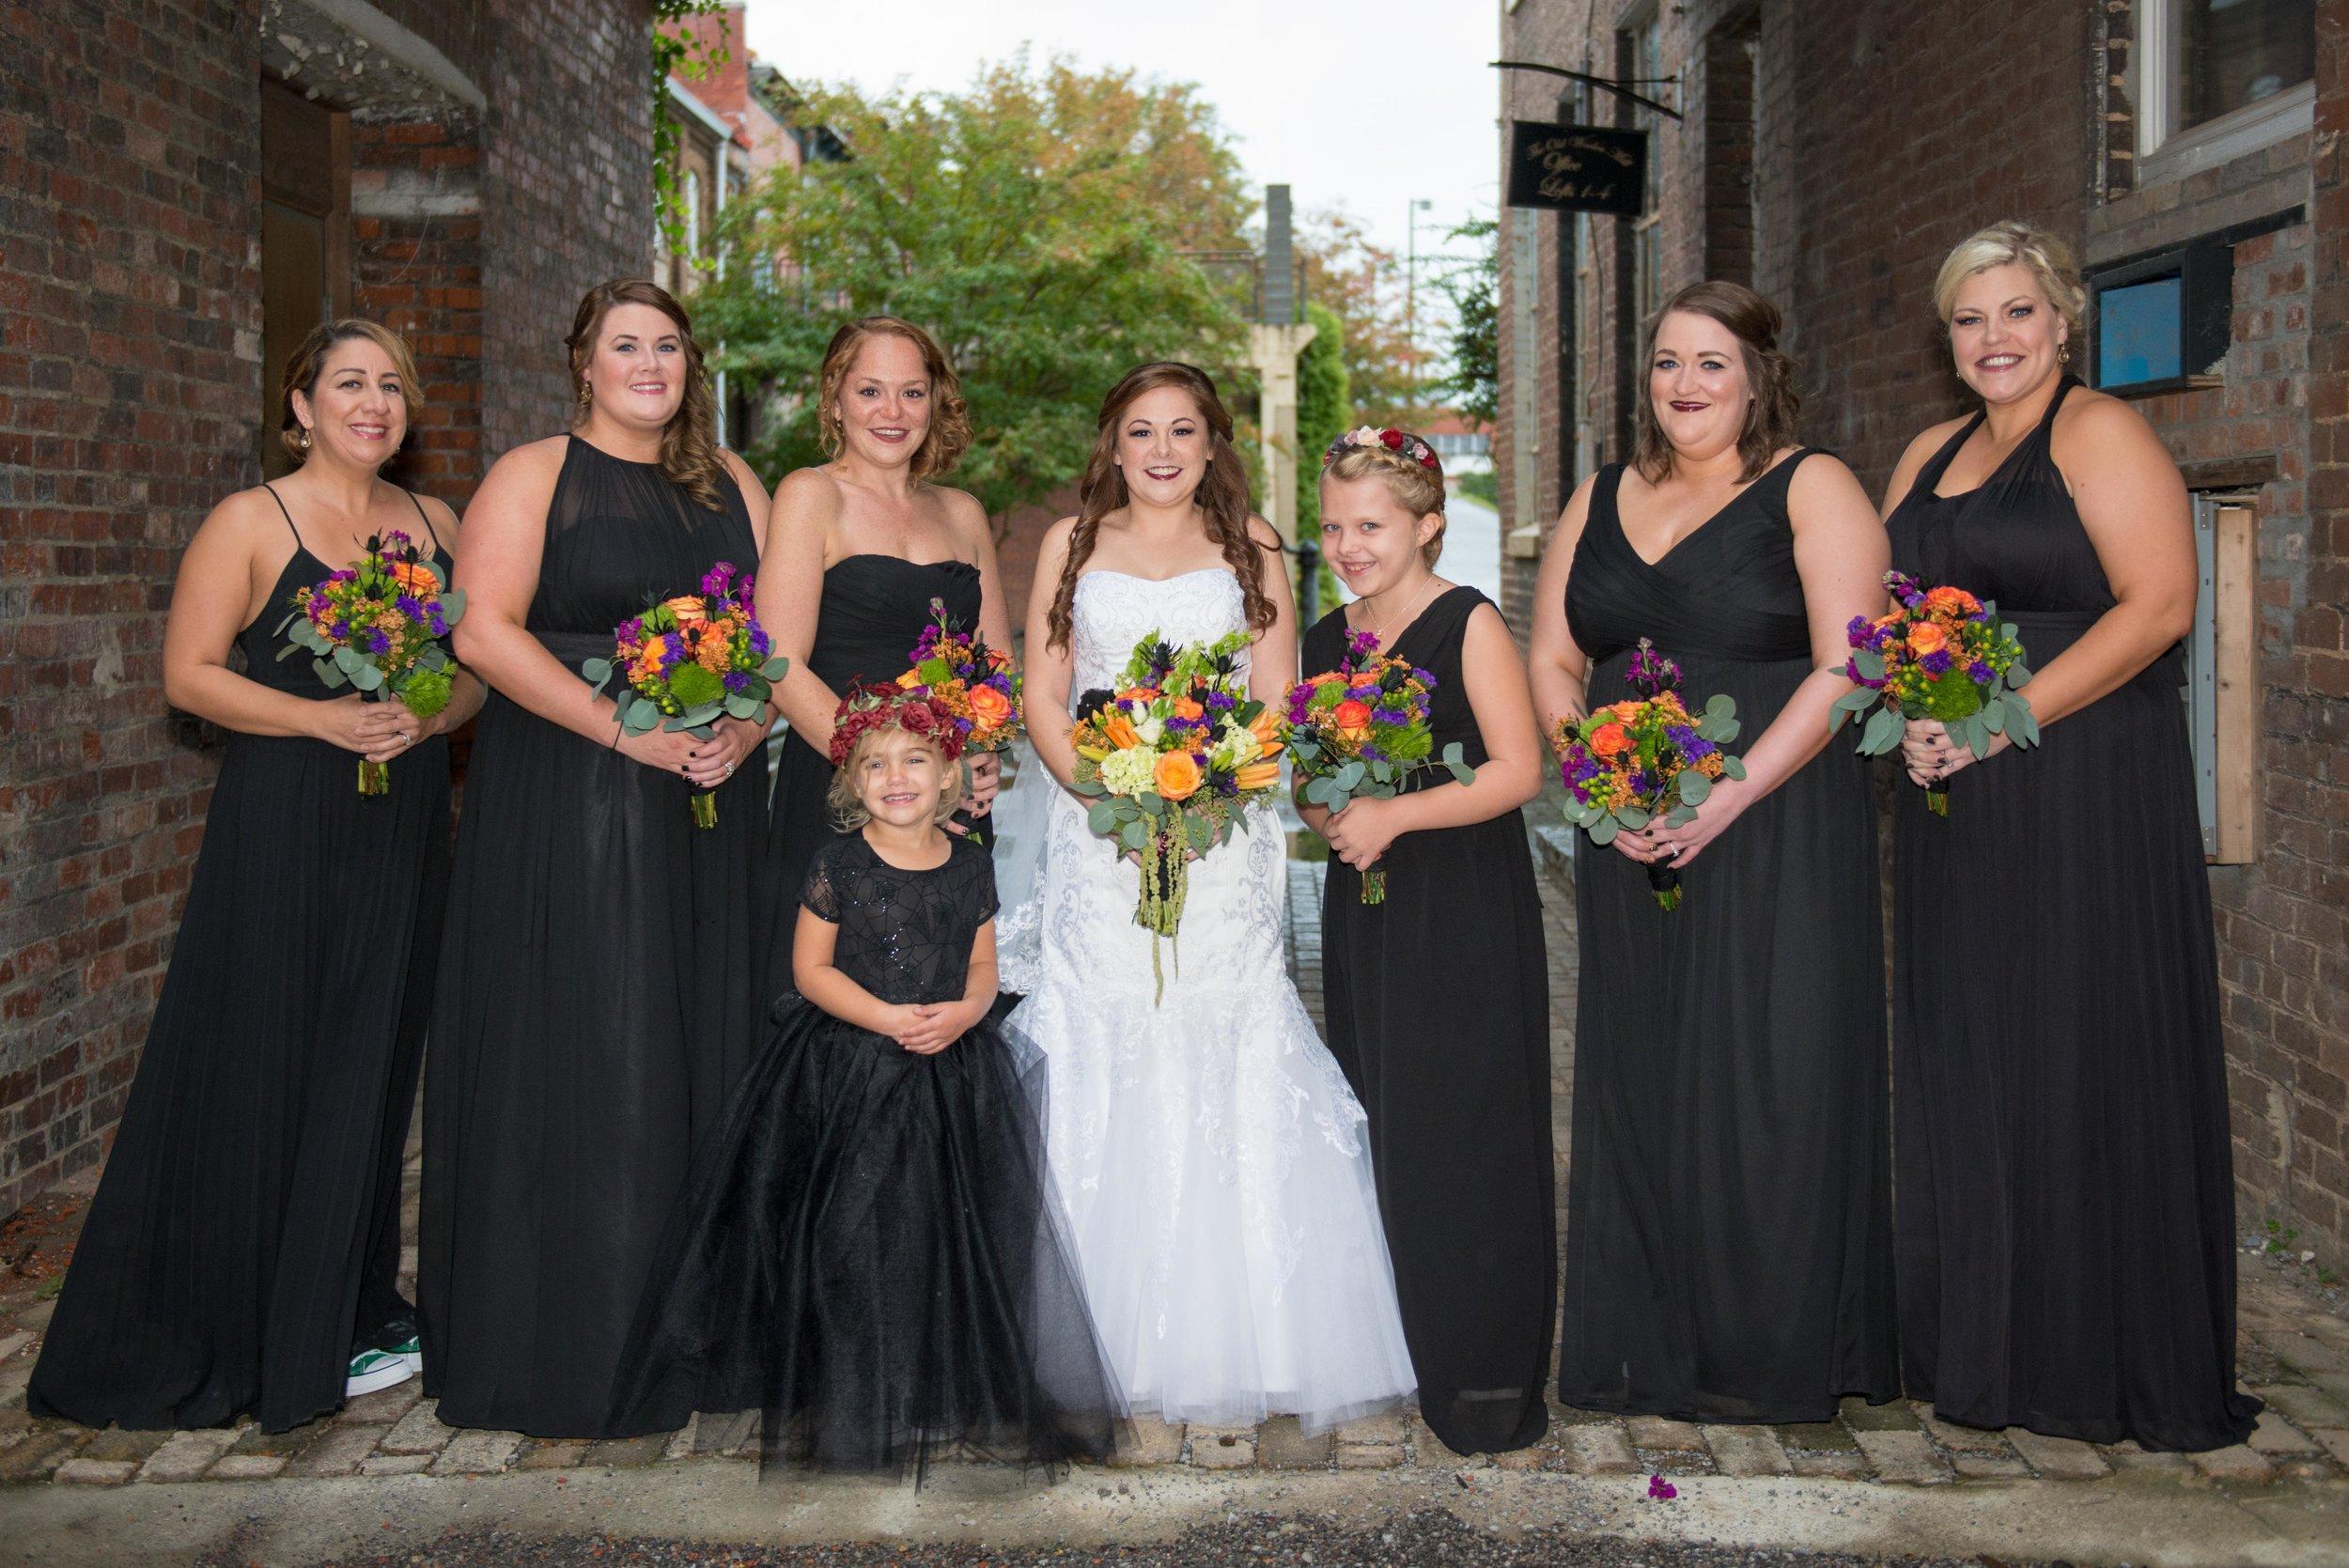 00001_Parker-Wedding-Sp-13.jpg